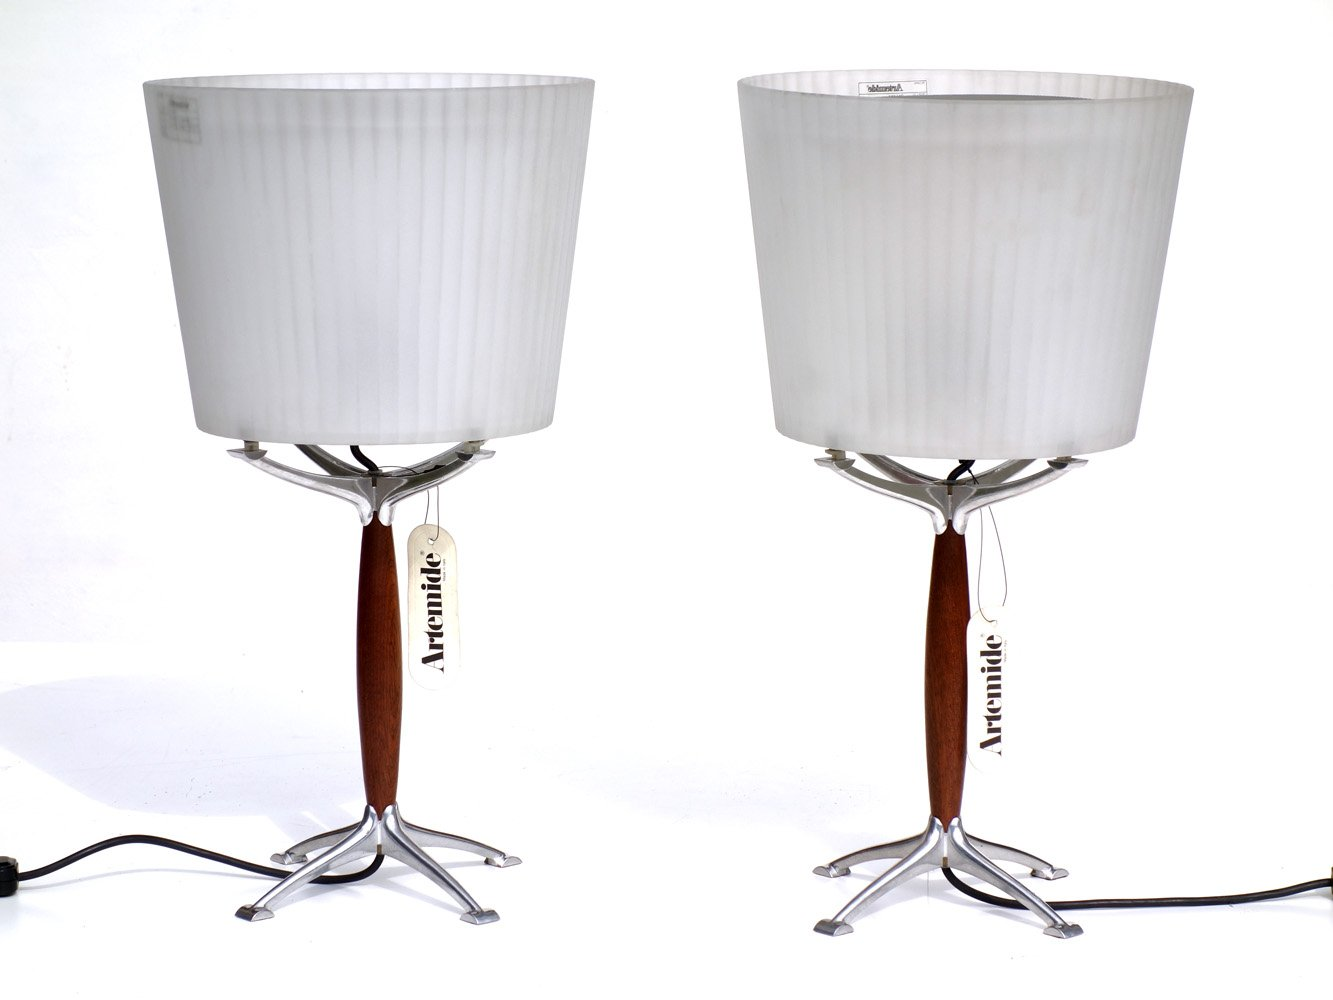 Orione Table Lamps By Rodolfo Dordoni For Artemide 1992